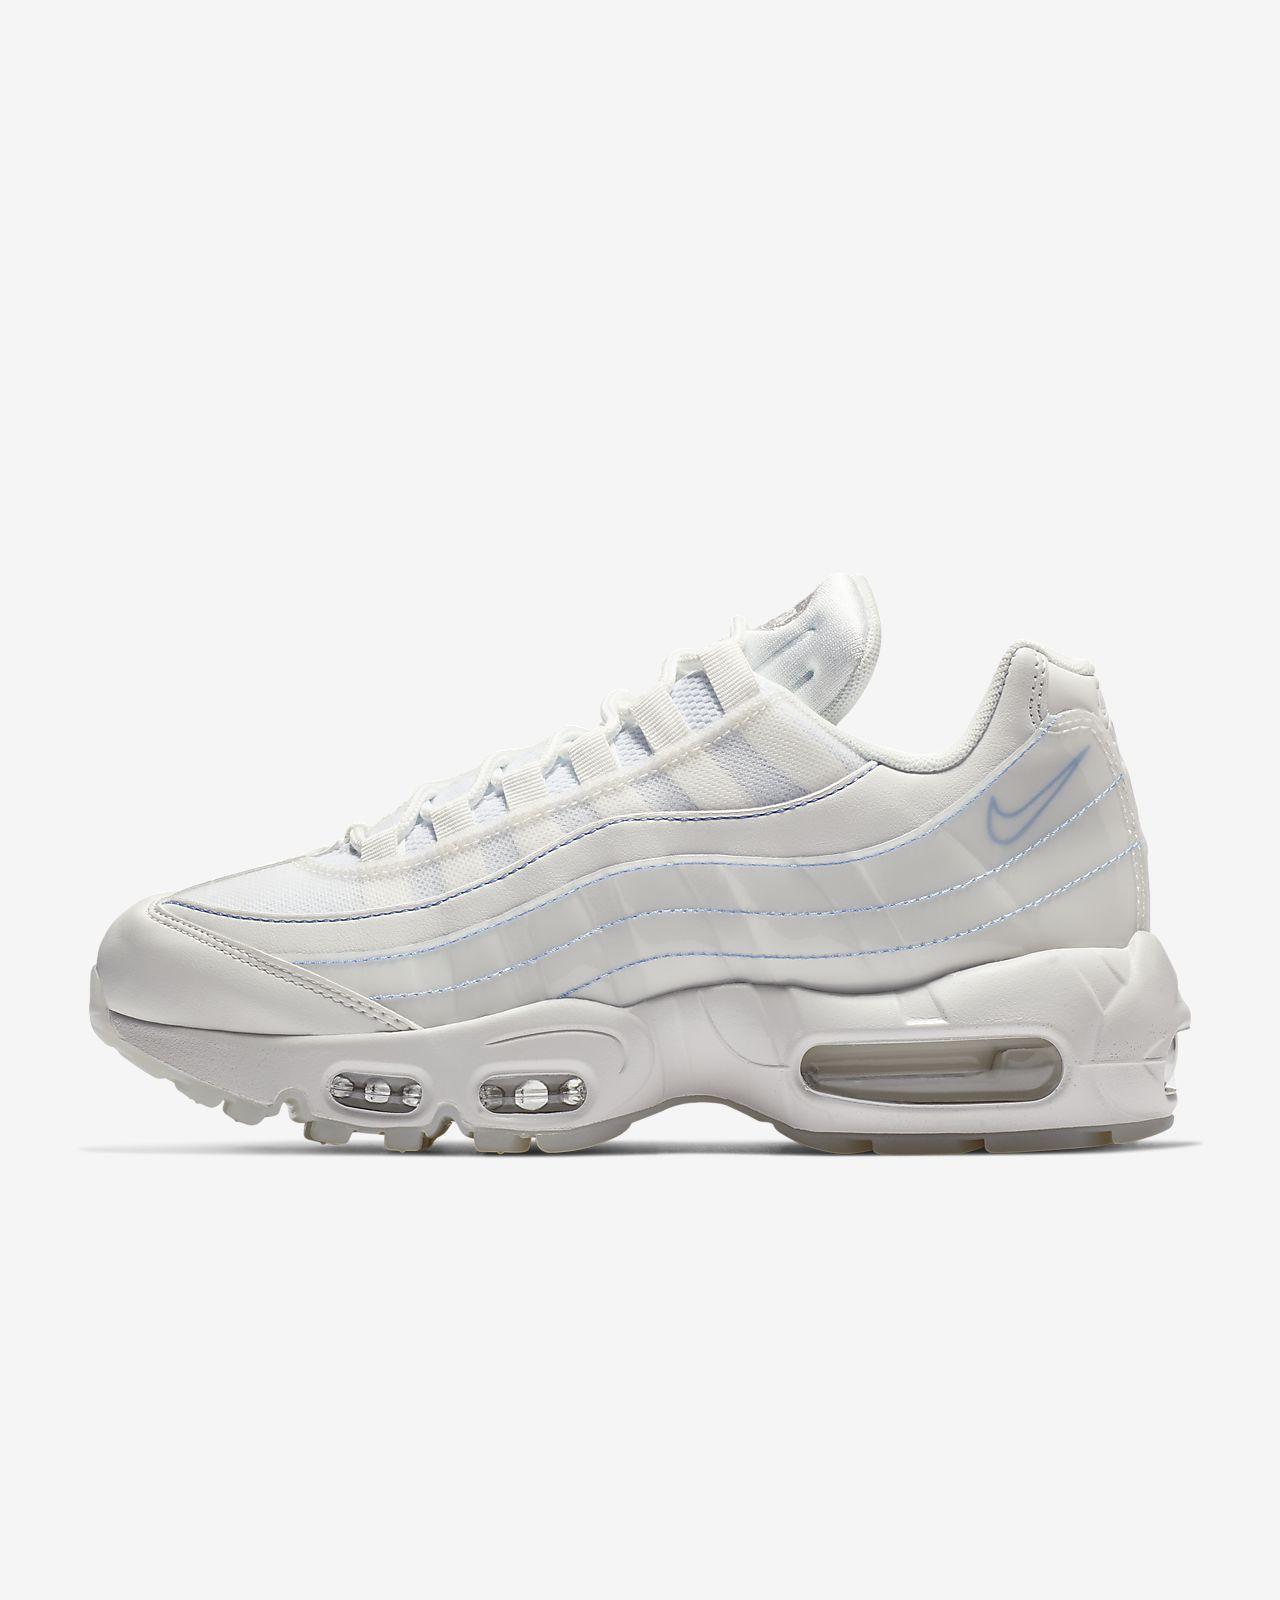 newest 32166 36694 Women s Shoe. Nike Air Max 95 SE